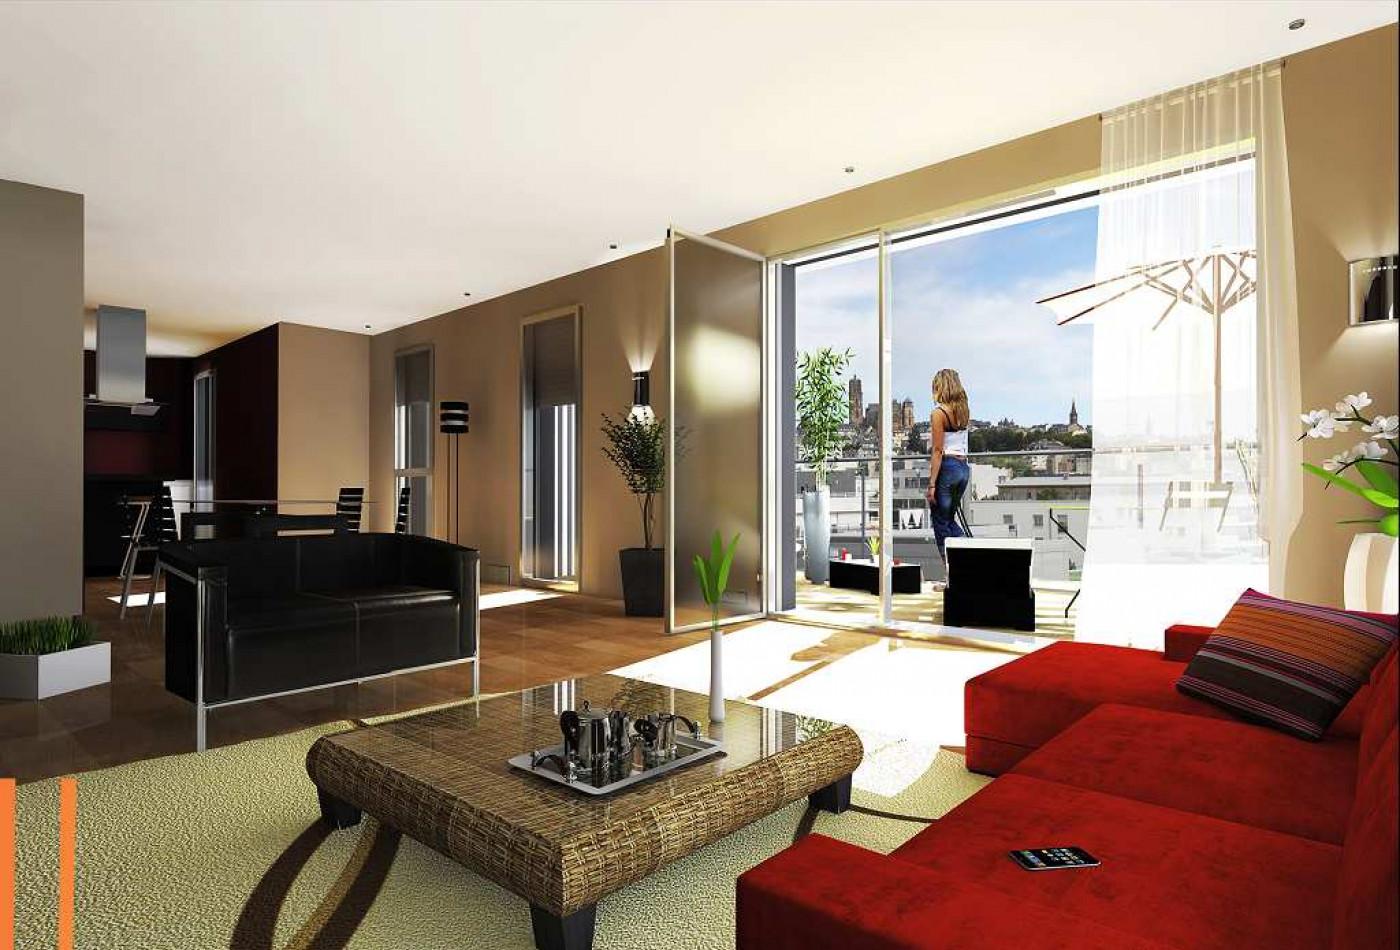 appartement en vente rodez r f 12005343 point habitat. Black Bedroom Furniture Sets. Home Design Ideas